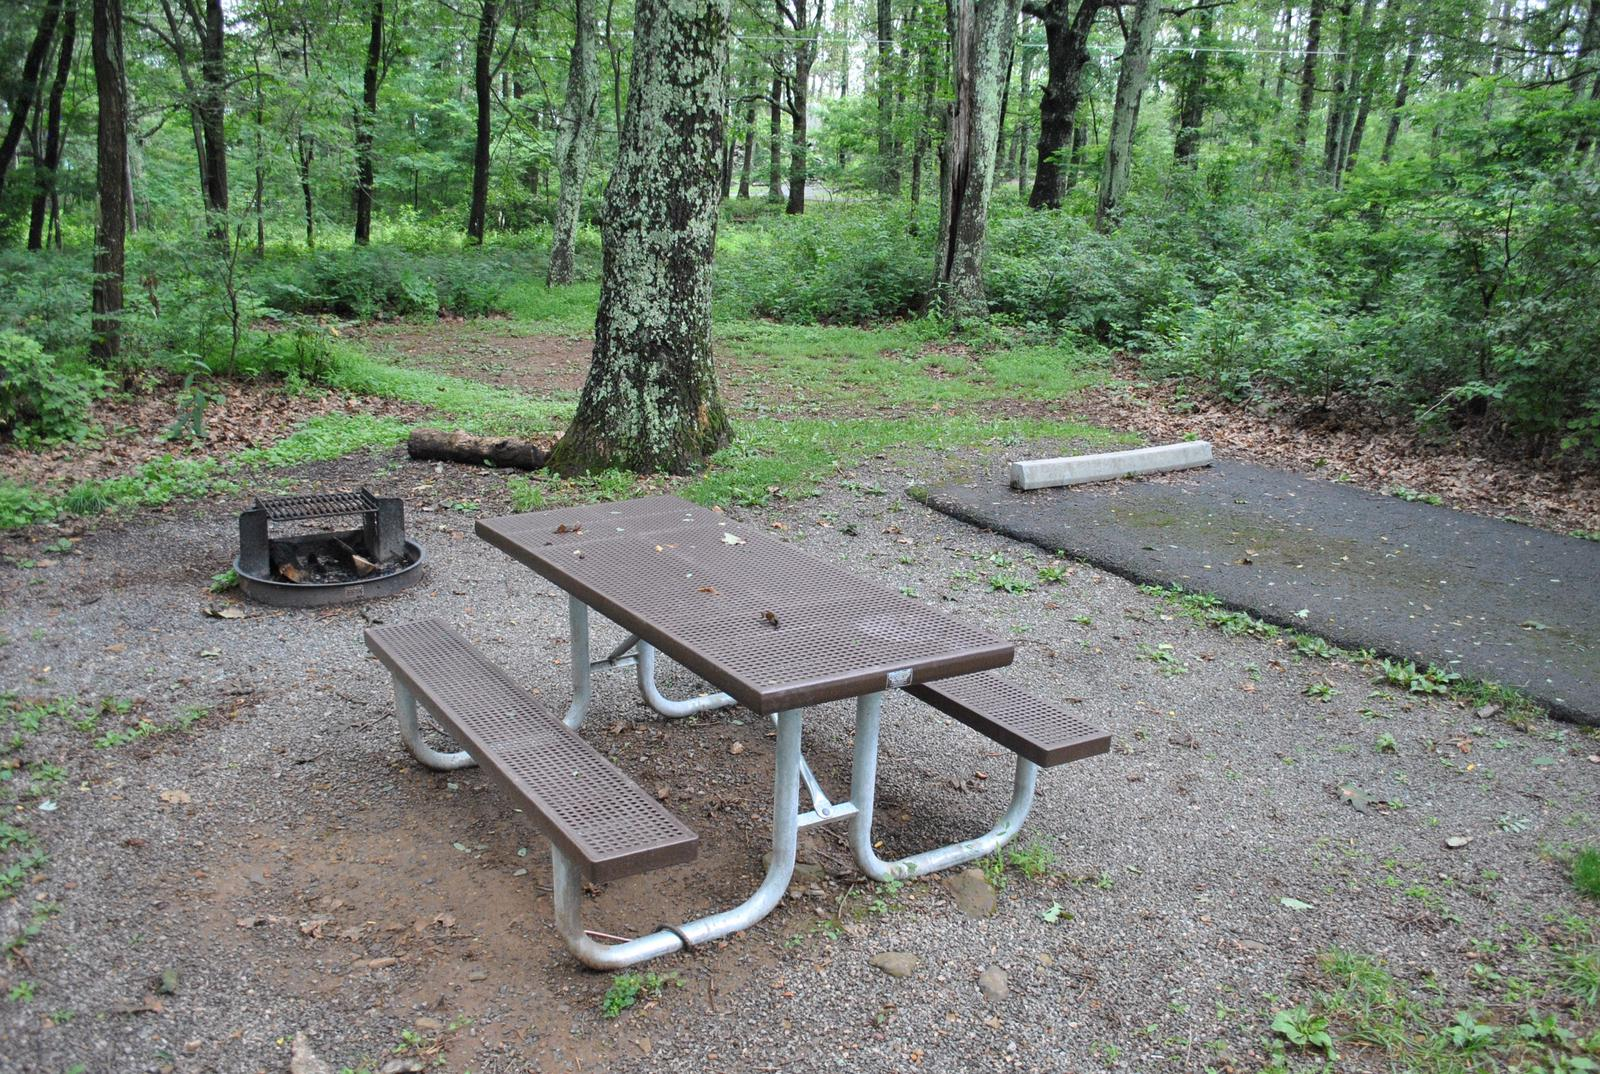 Mathews Arm Campground - Site B138